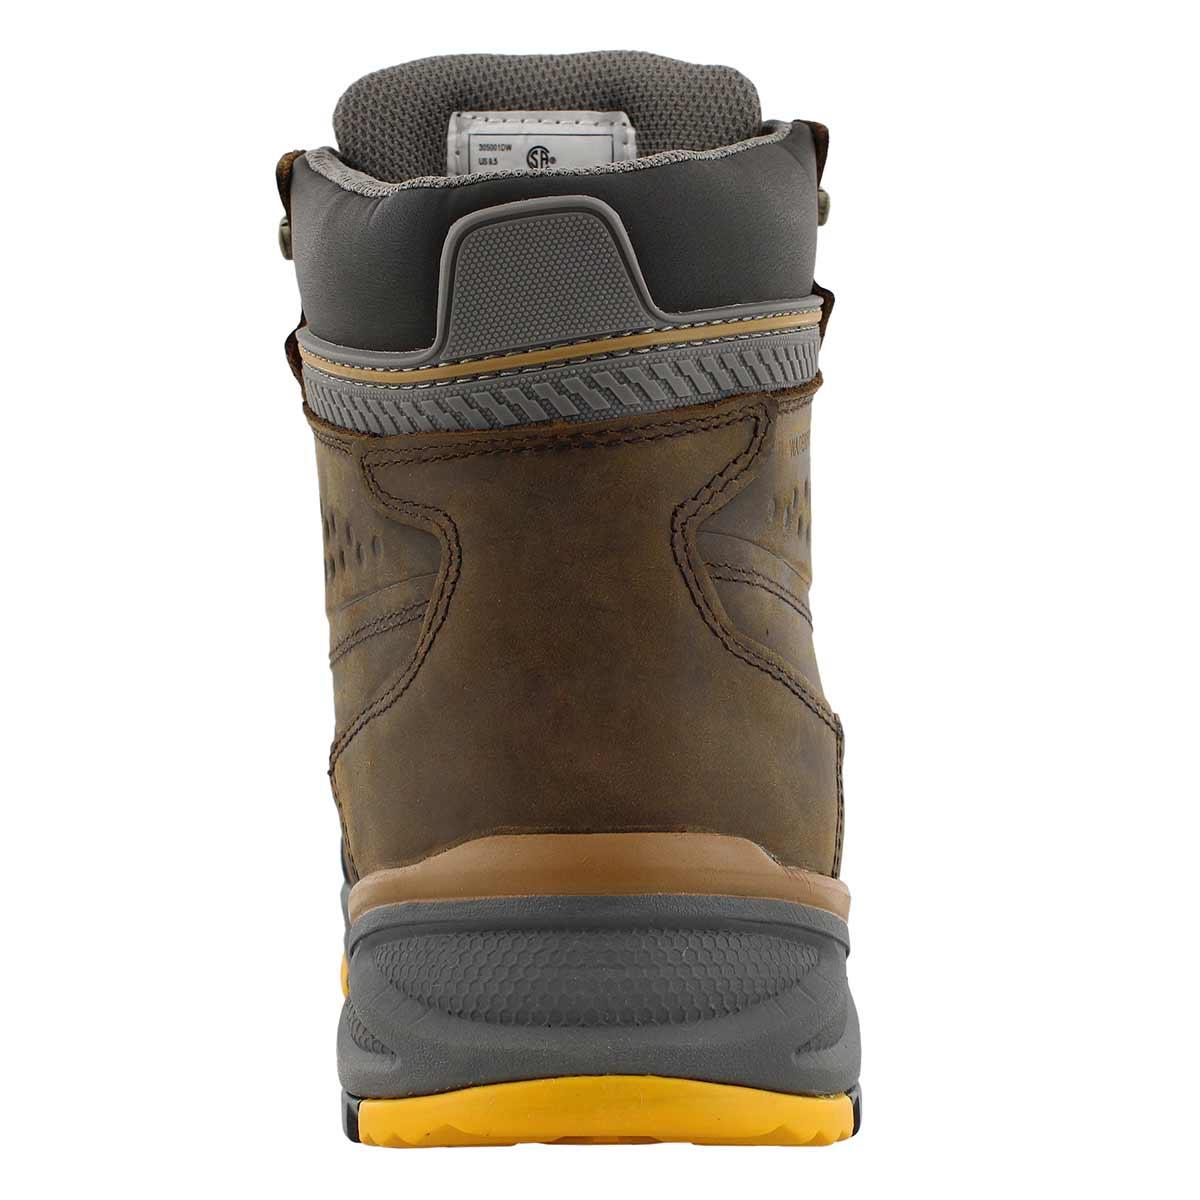 Mns Crusade brn lace up wtpf CSA boot